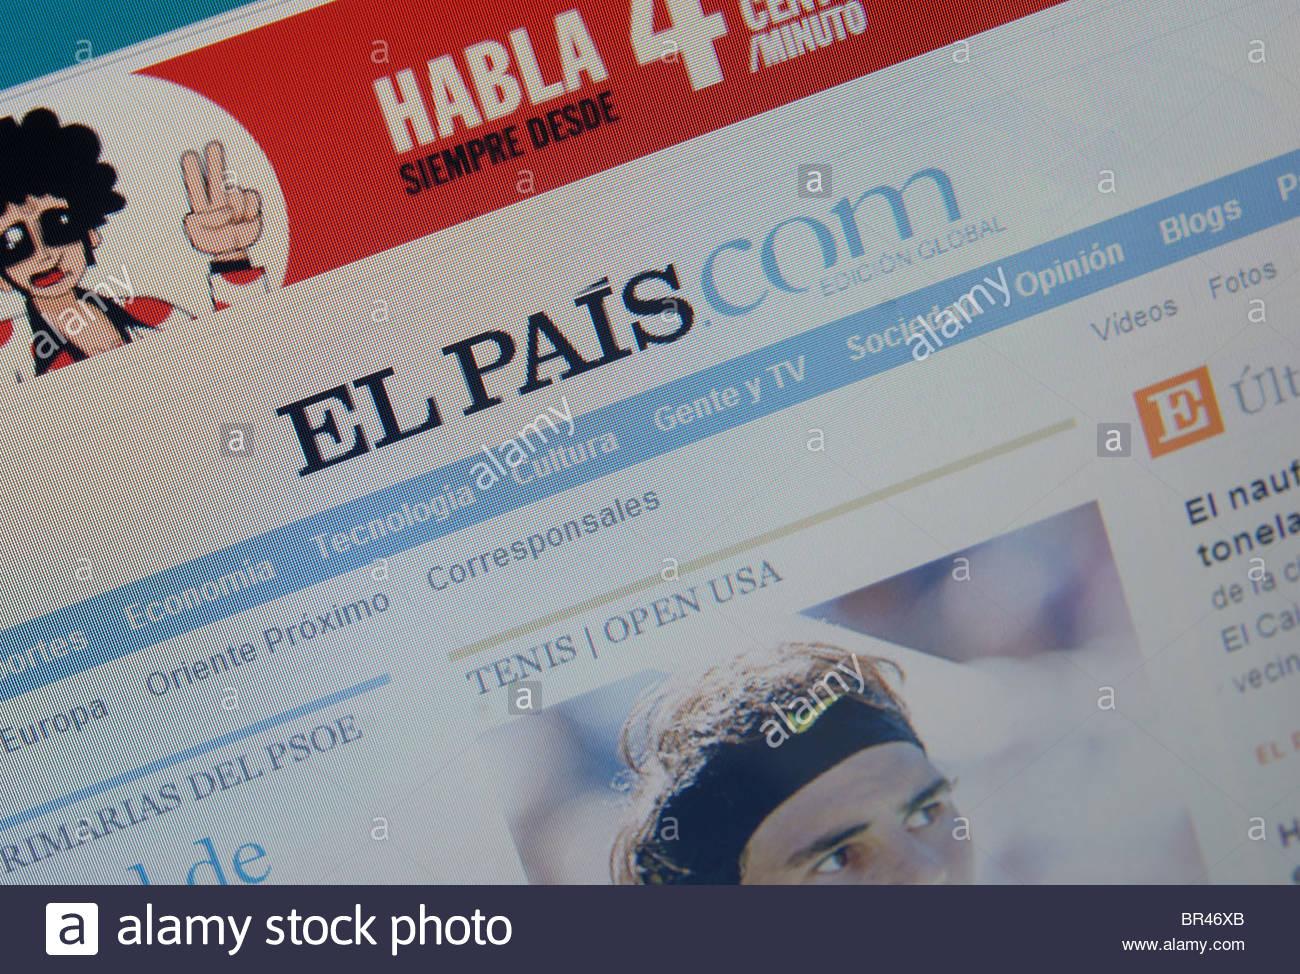 El Pais Spanish newspaper website Stock Photo: 31440707 - Alamy